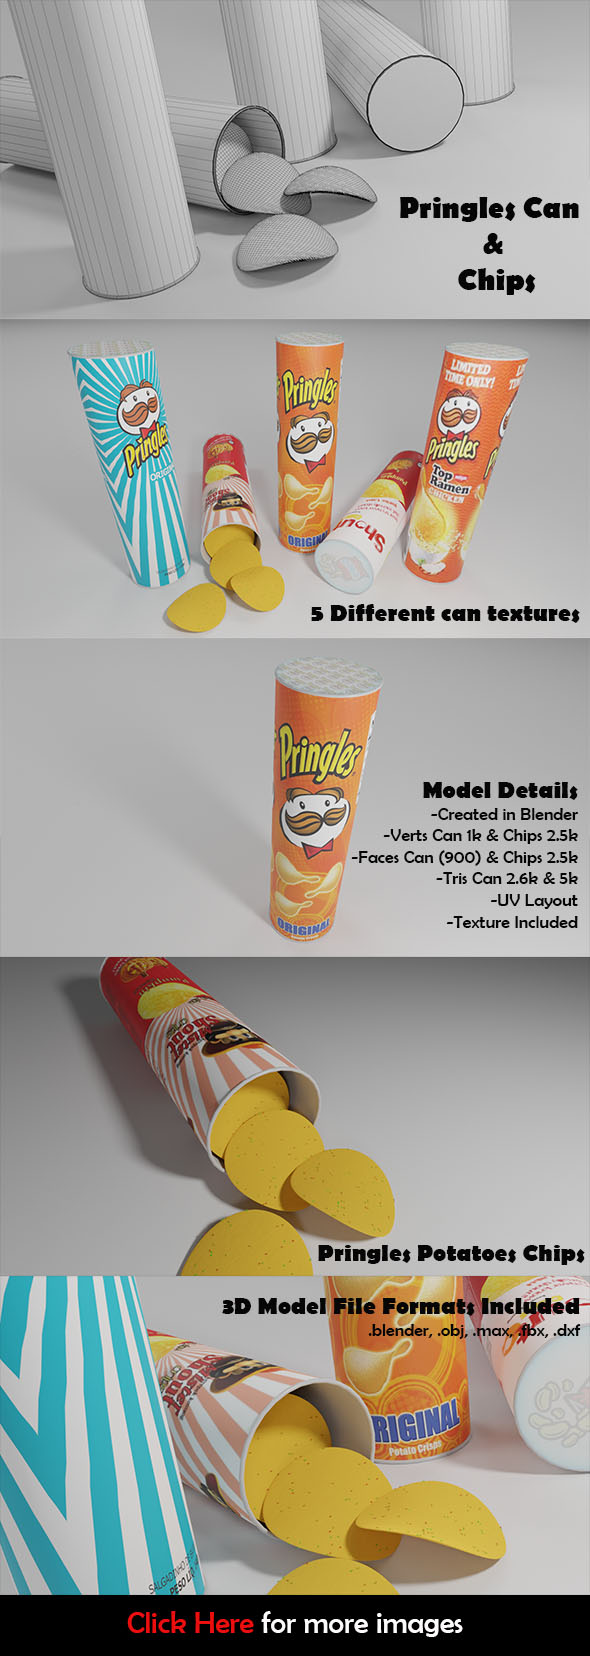 Pringles Can & Shout Potato Chips 3D Model